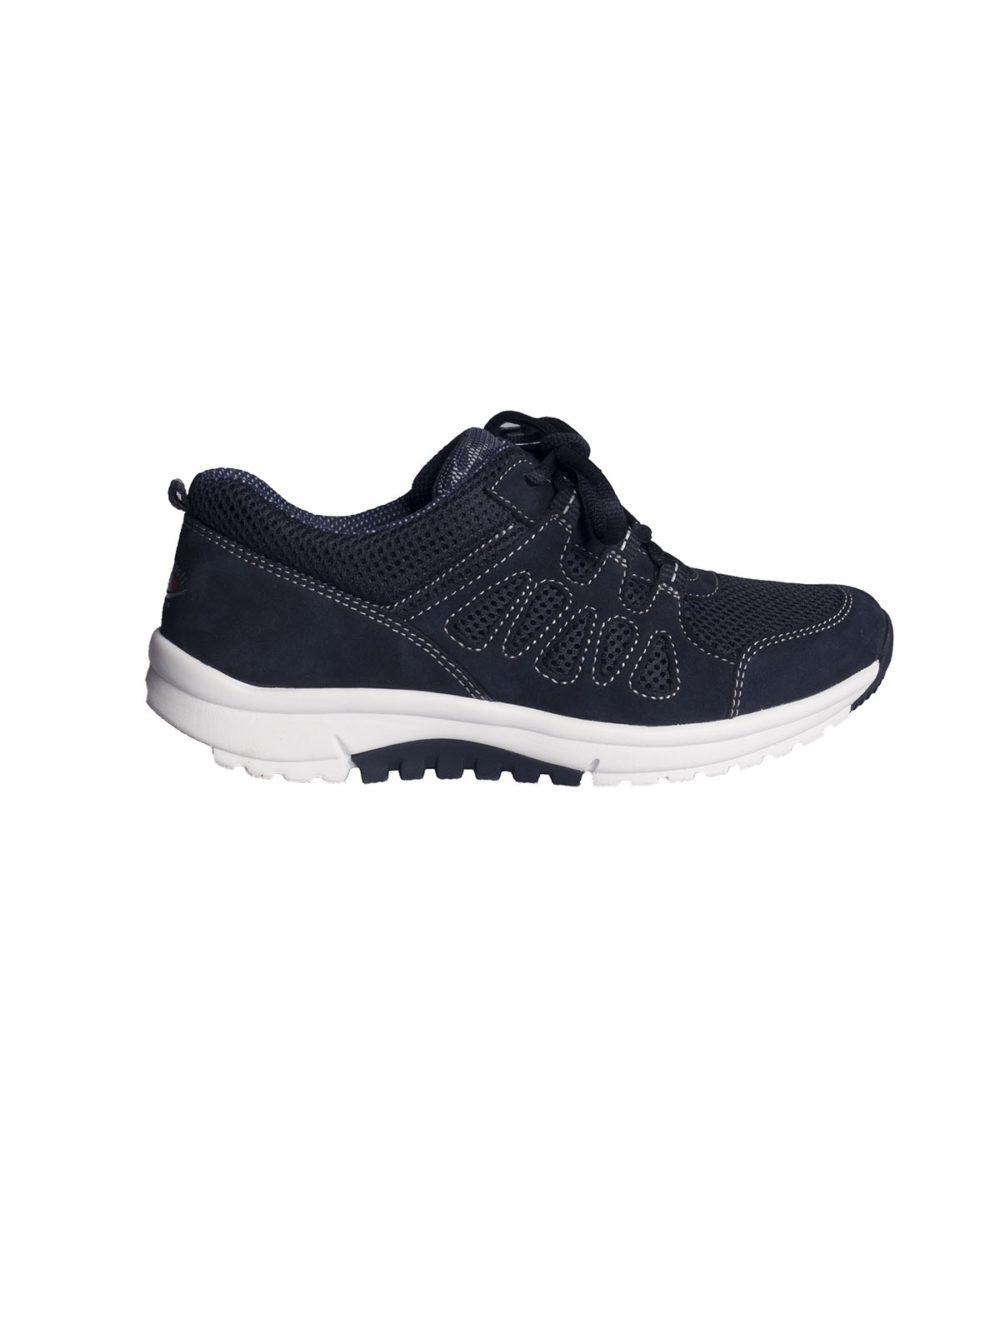 Abundance Shoe Gabor Katie Kerr Women's Shoes